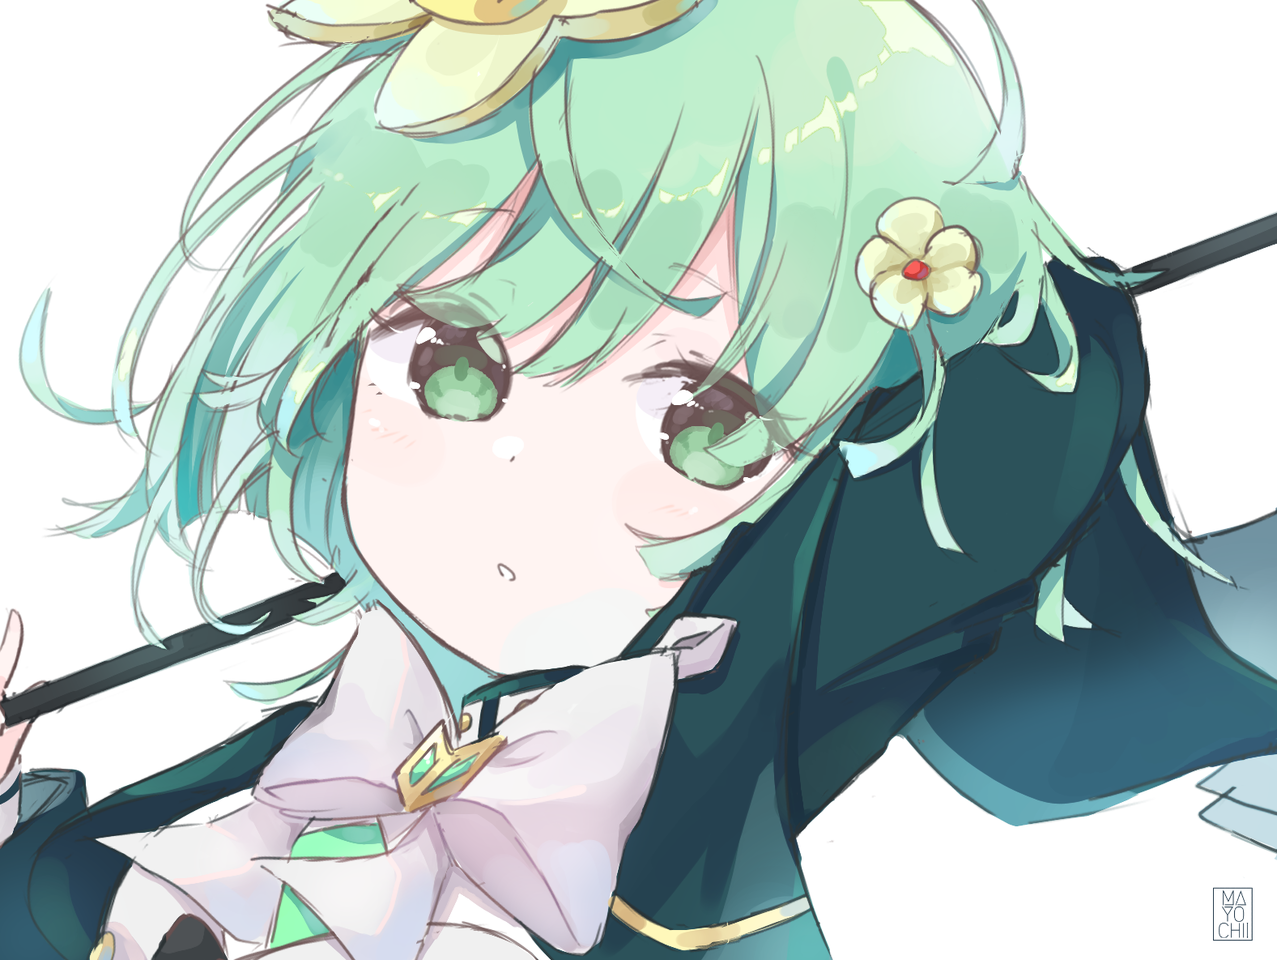 Kako Illust of Chi medibangpaint anime girl magiarecord magicalgirl fanart videogame Puella_Magi_Madoka_Magica